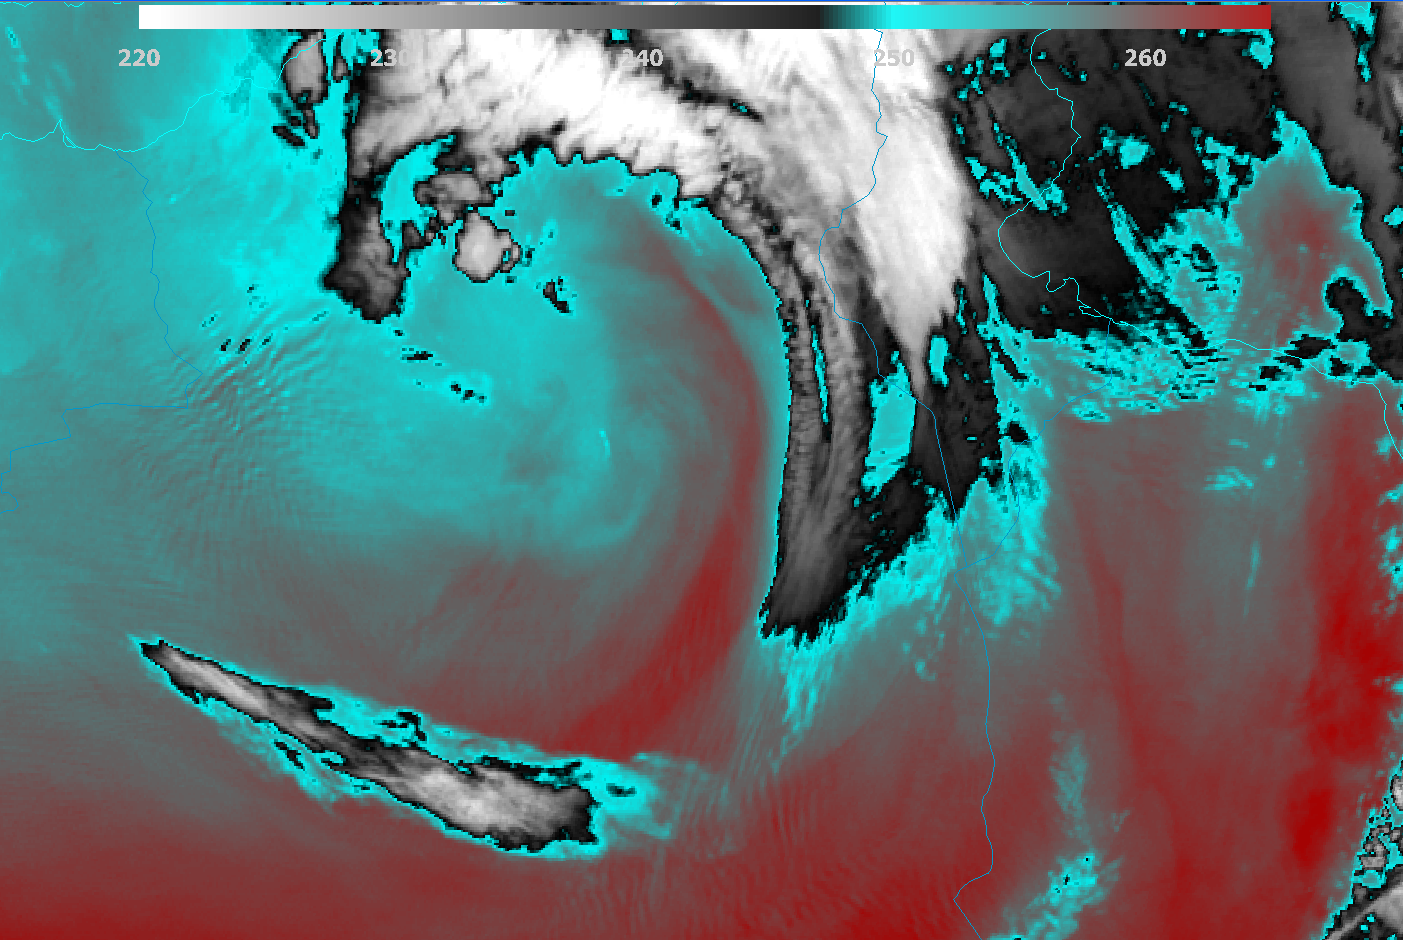 Meteosat-11 Water Vapour 7.3µm channel, 18 December 00:00 UTC.